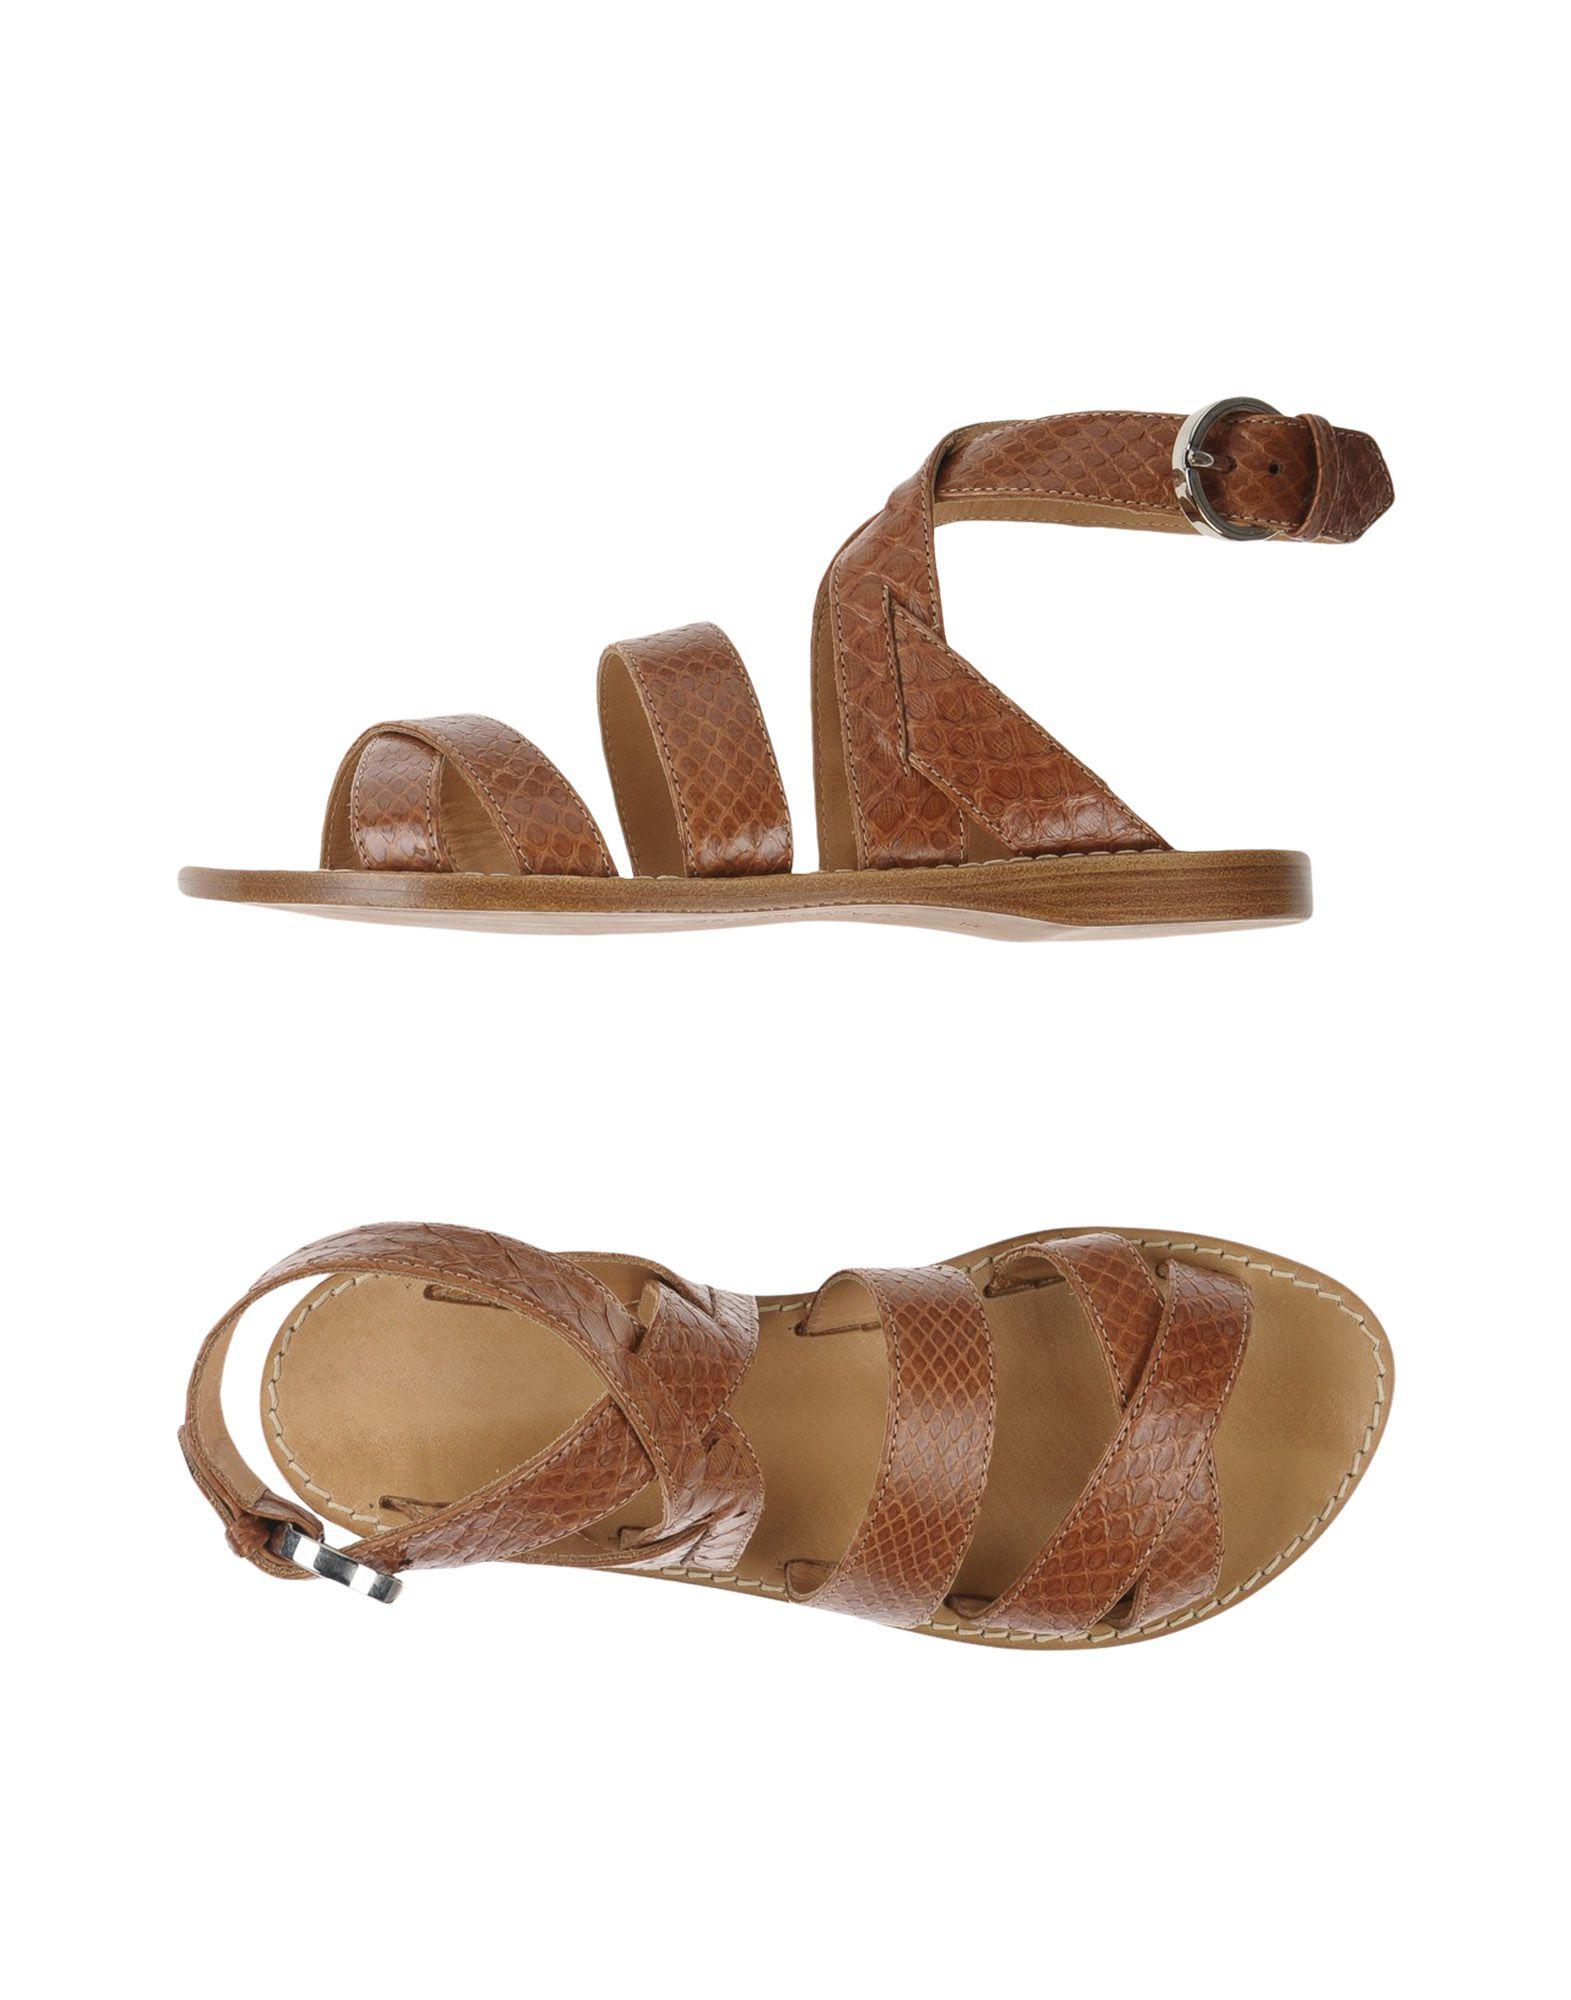 Sandales Sem Vaccaro Femme - Sandales Sem Vaccaro sur